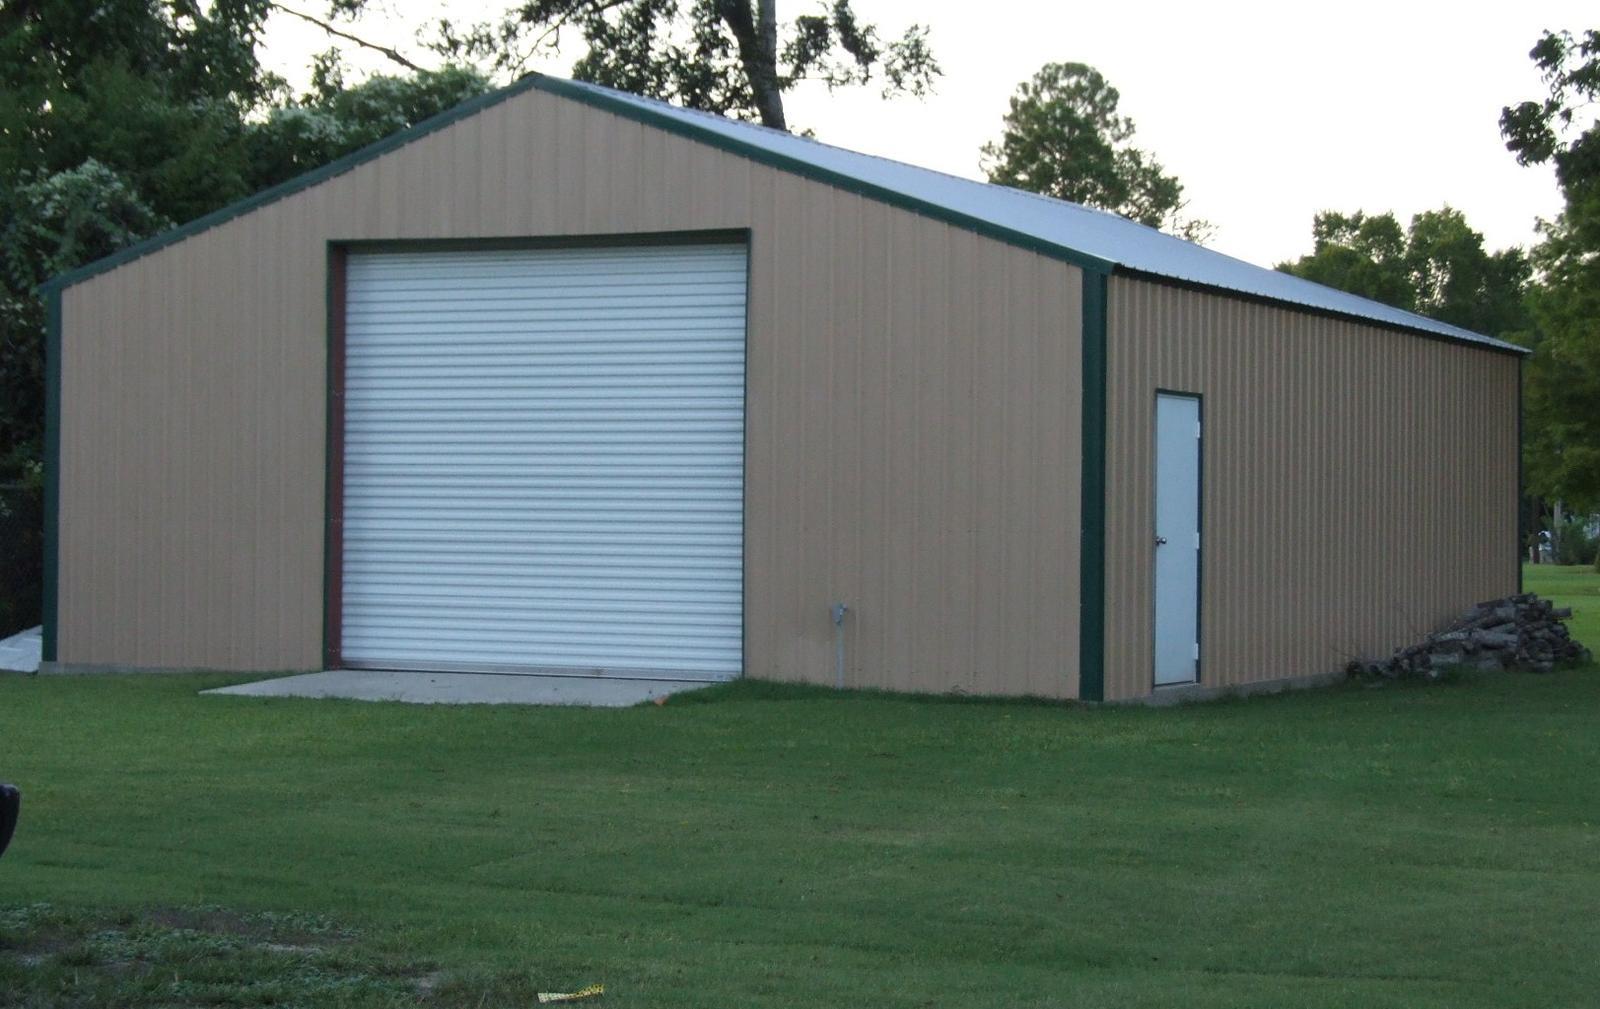 100 100 barn home interiors horse pole buildings for Pole barn house with basement